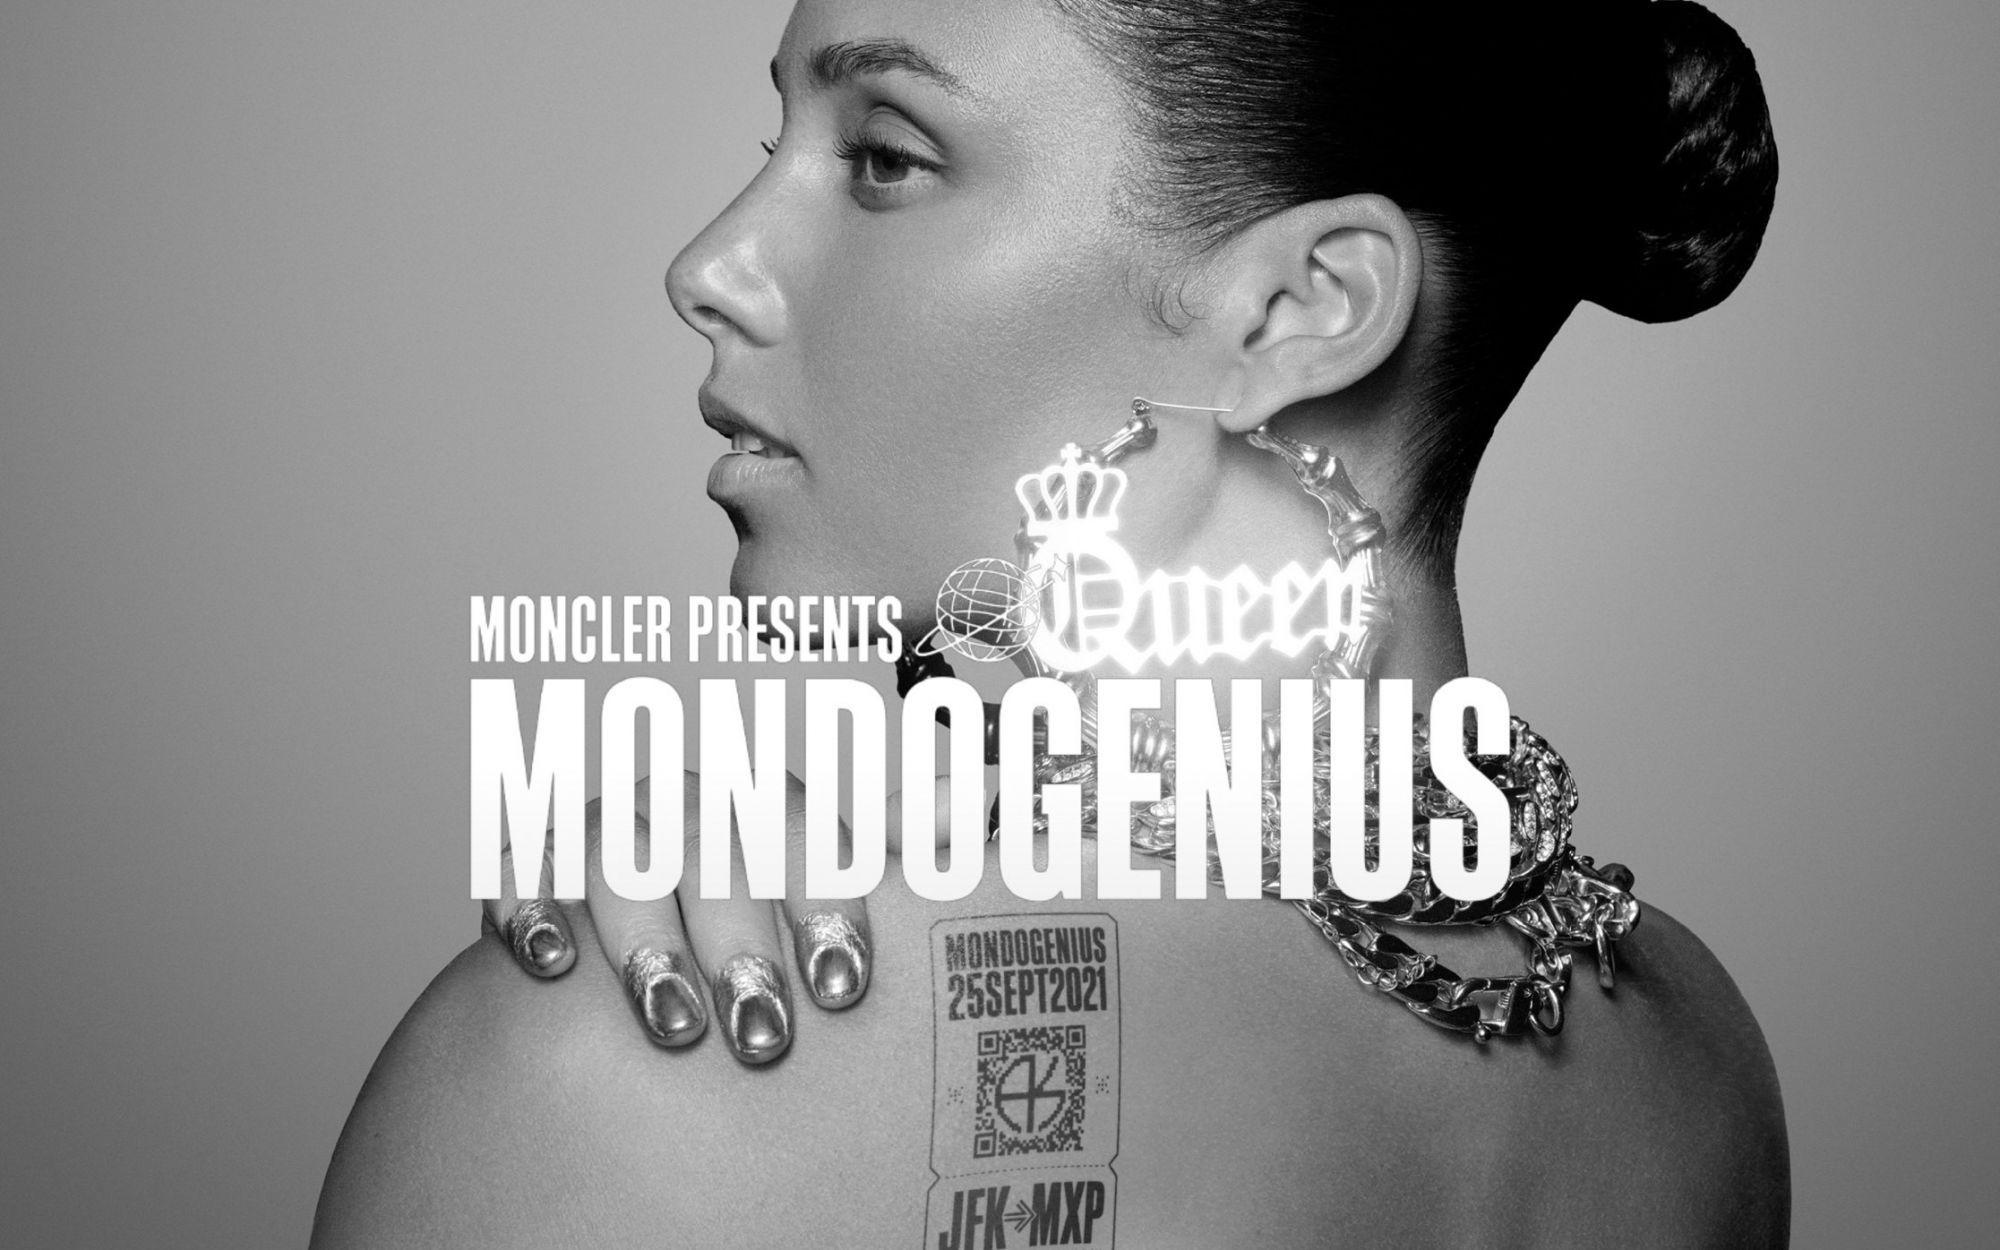 Moncler presents MondoGenius hosted by Alicia Keys